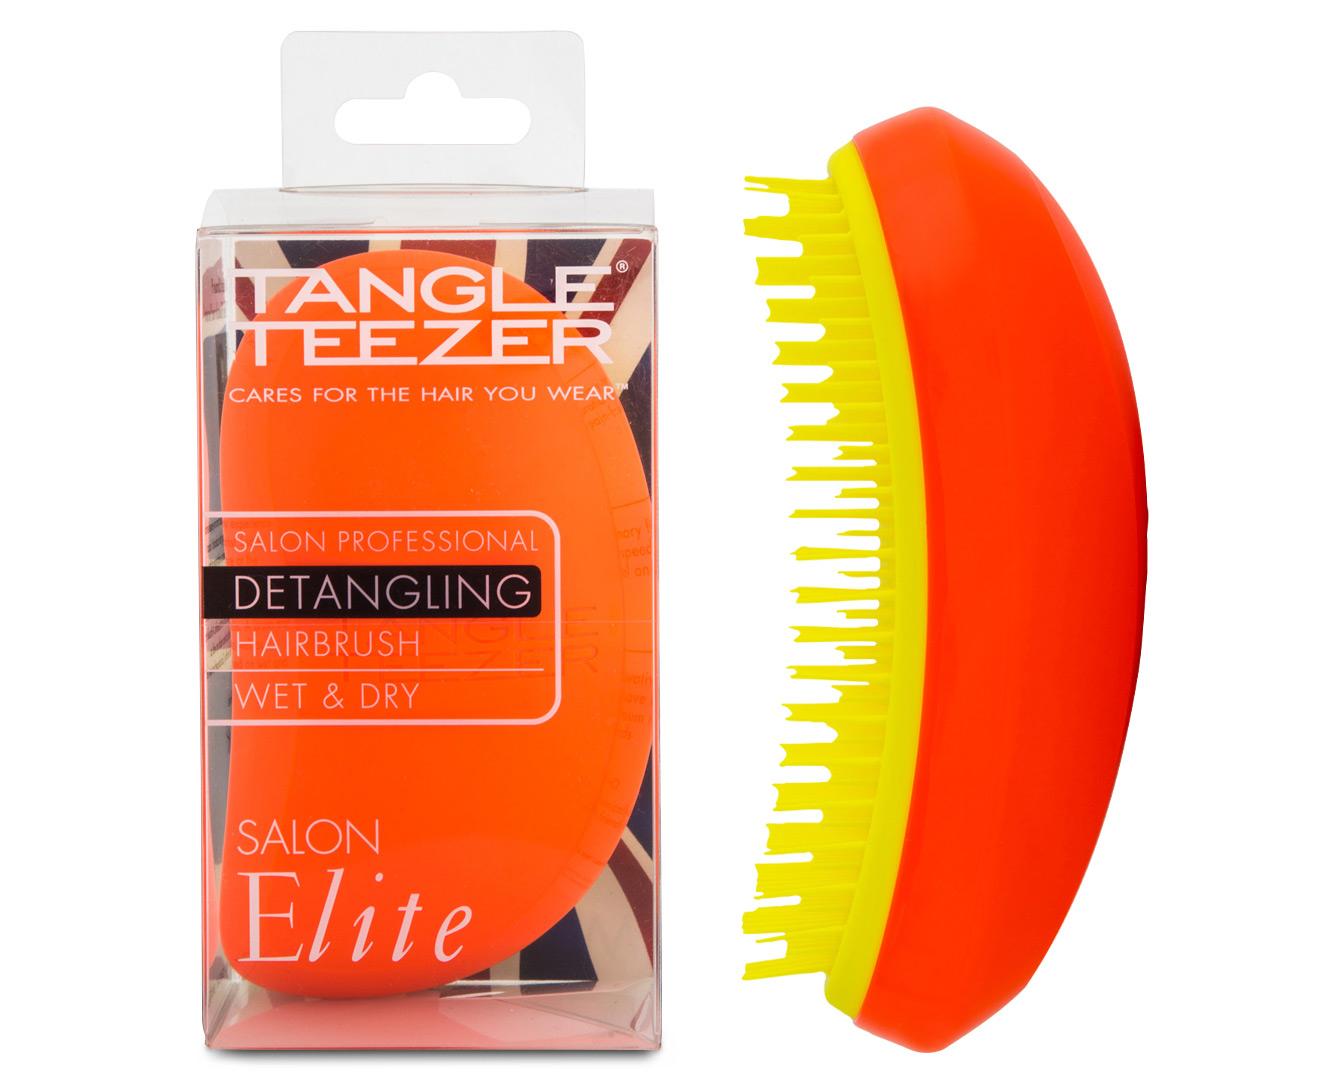 Tangle teezer salon elite detangling hairbrush orange for Salon orange